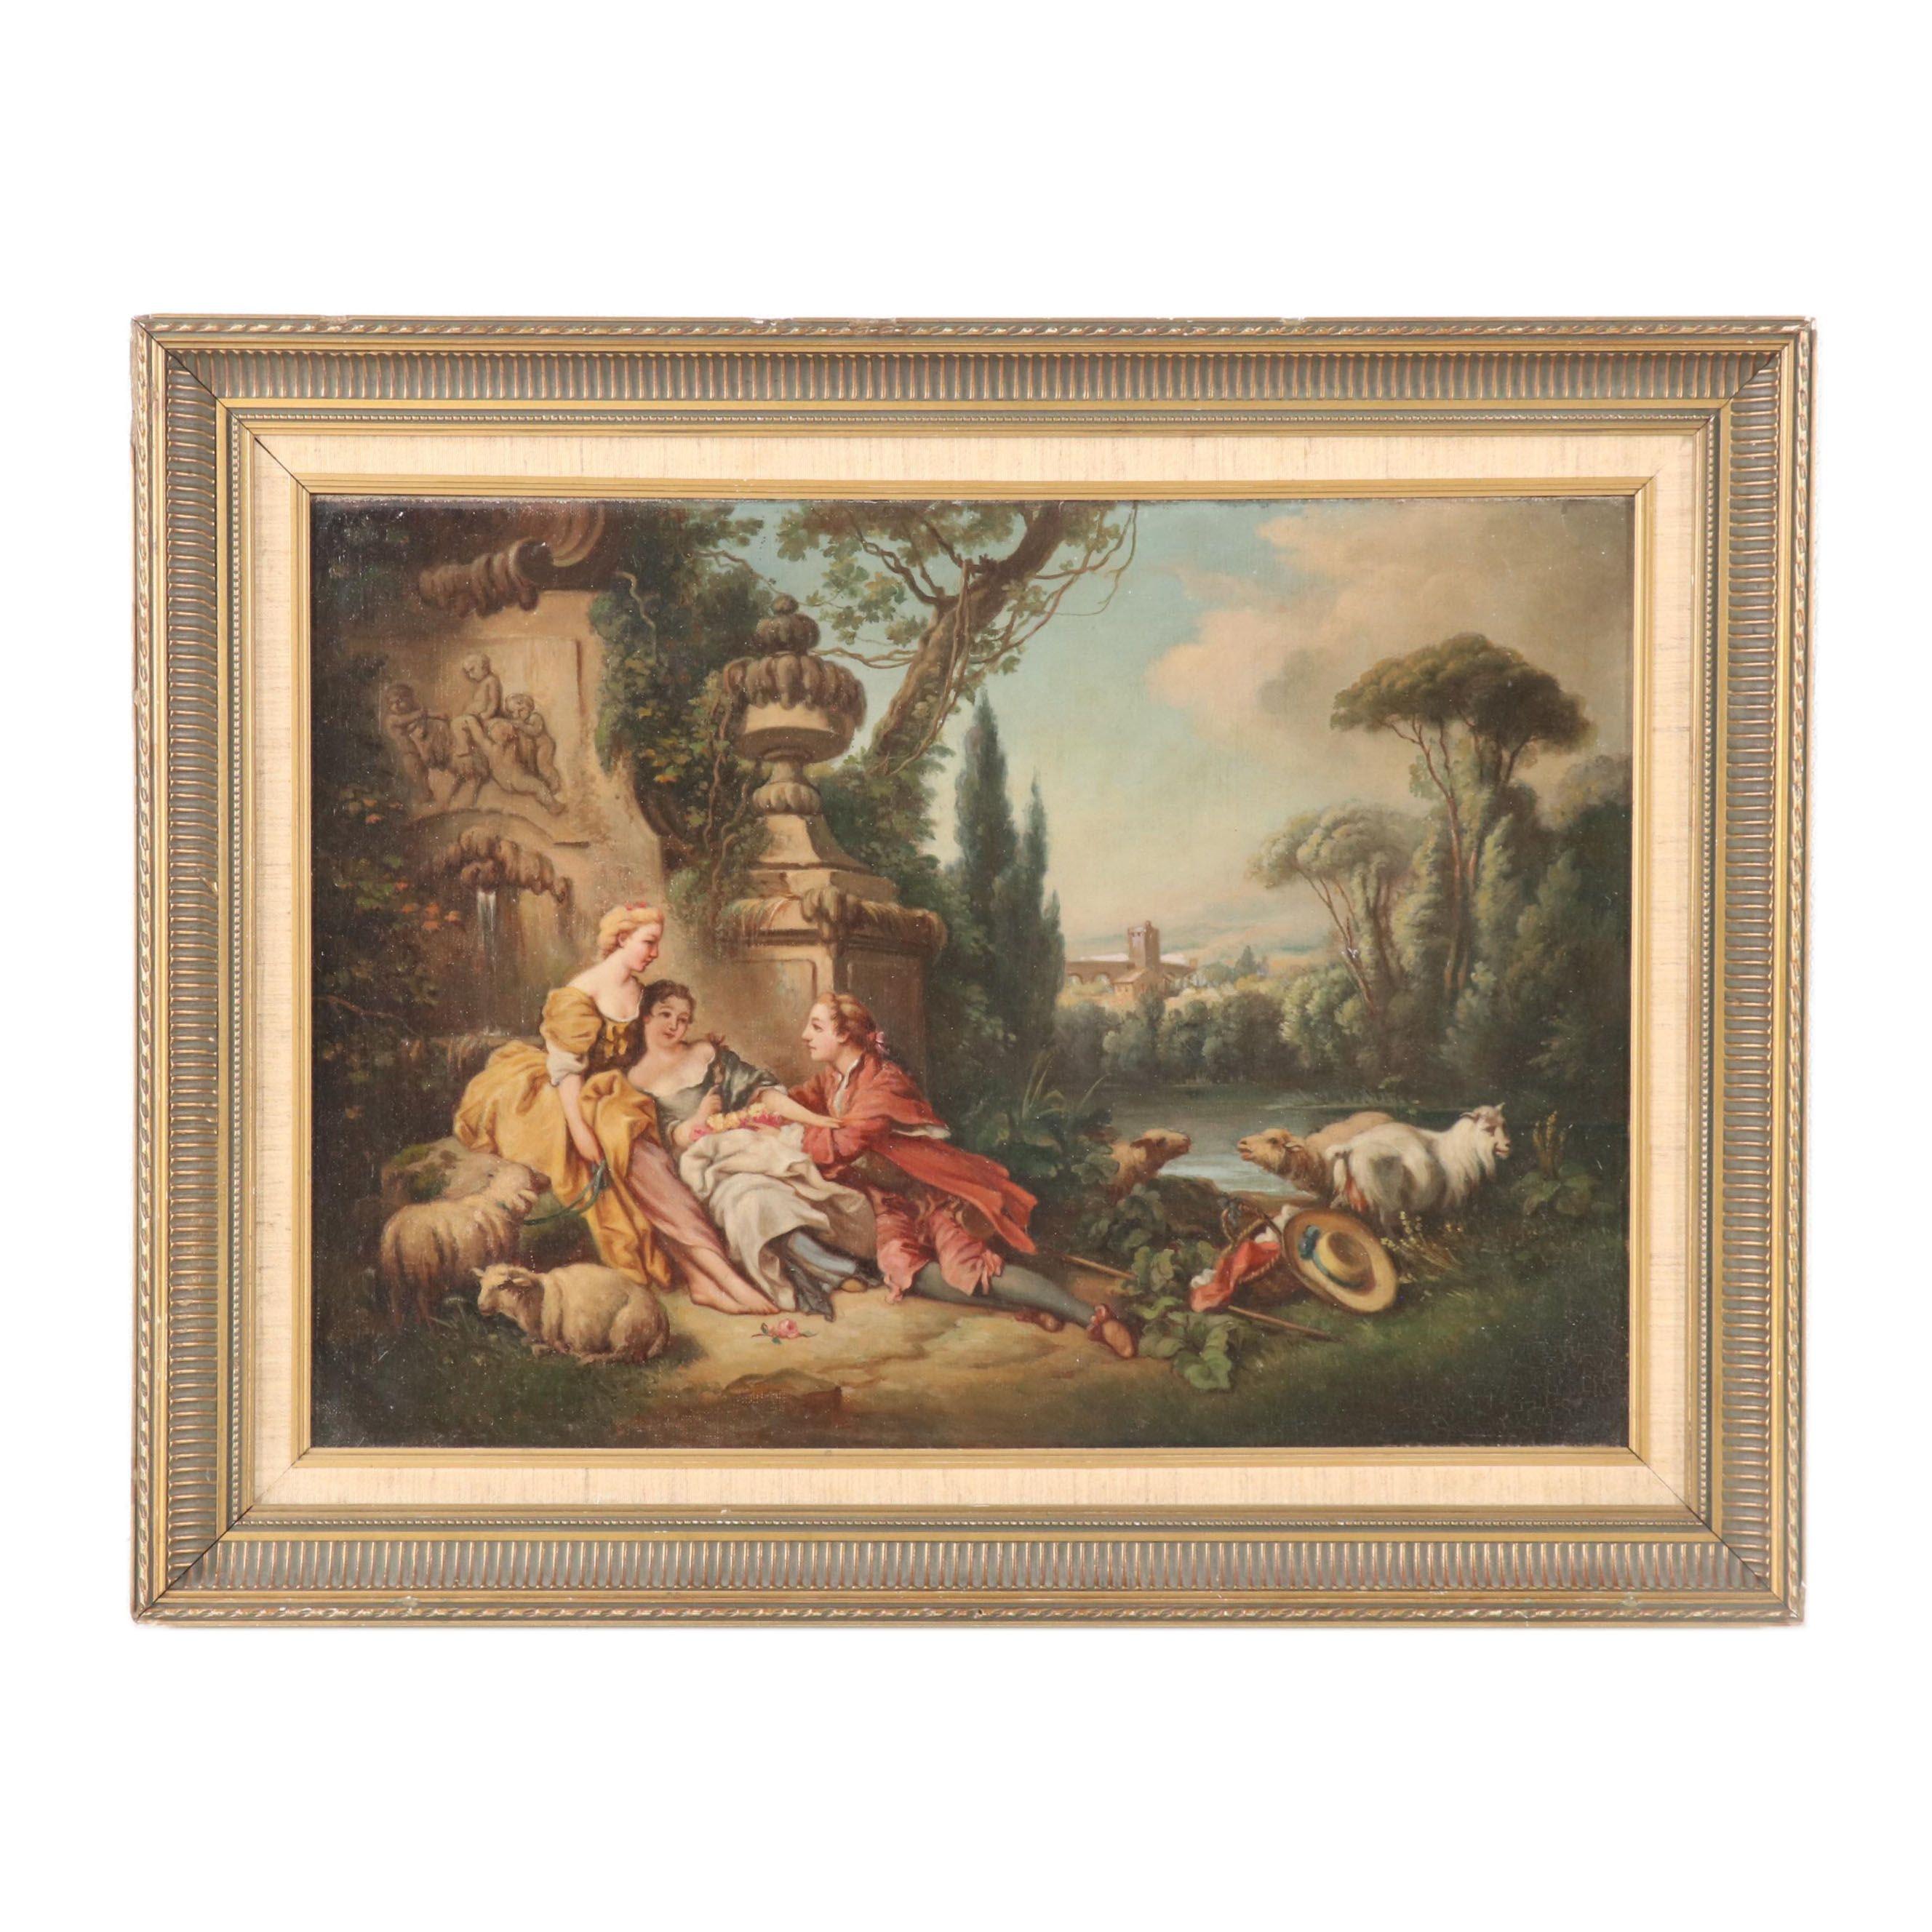 Copy Oil Painting after Francois Boucher